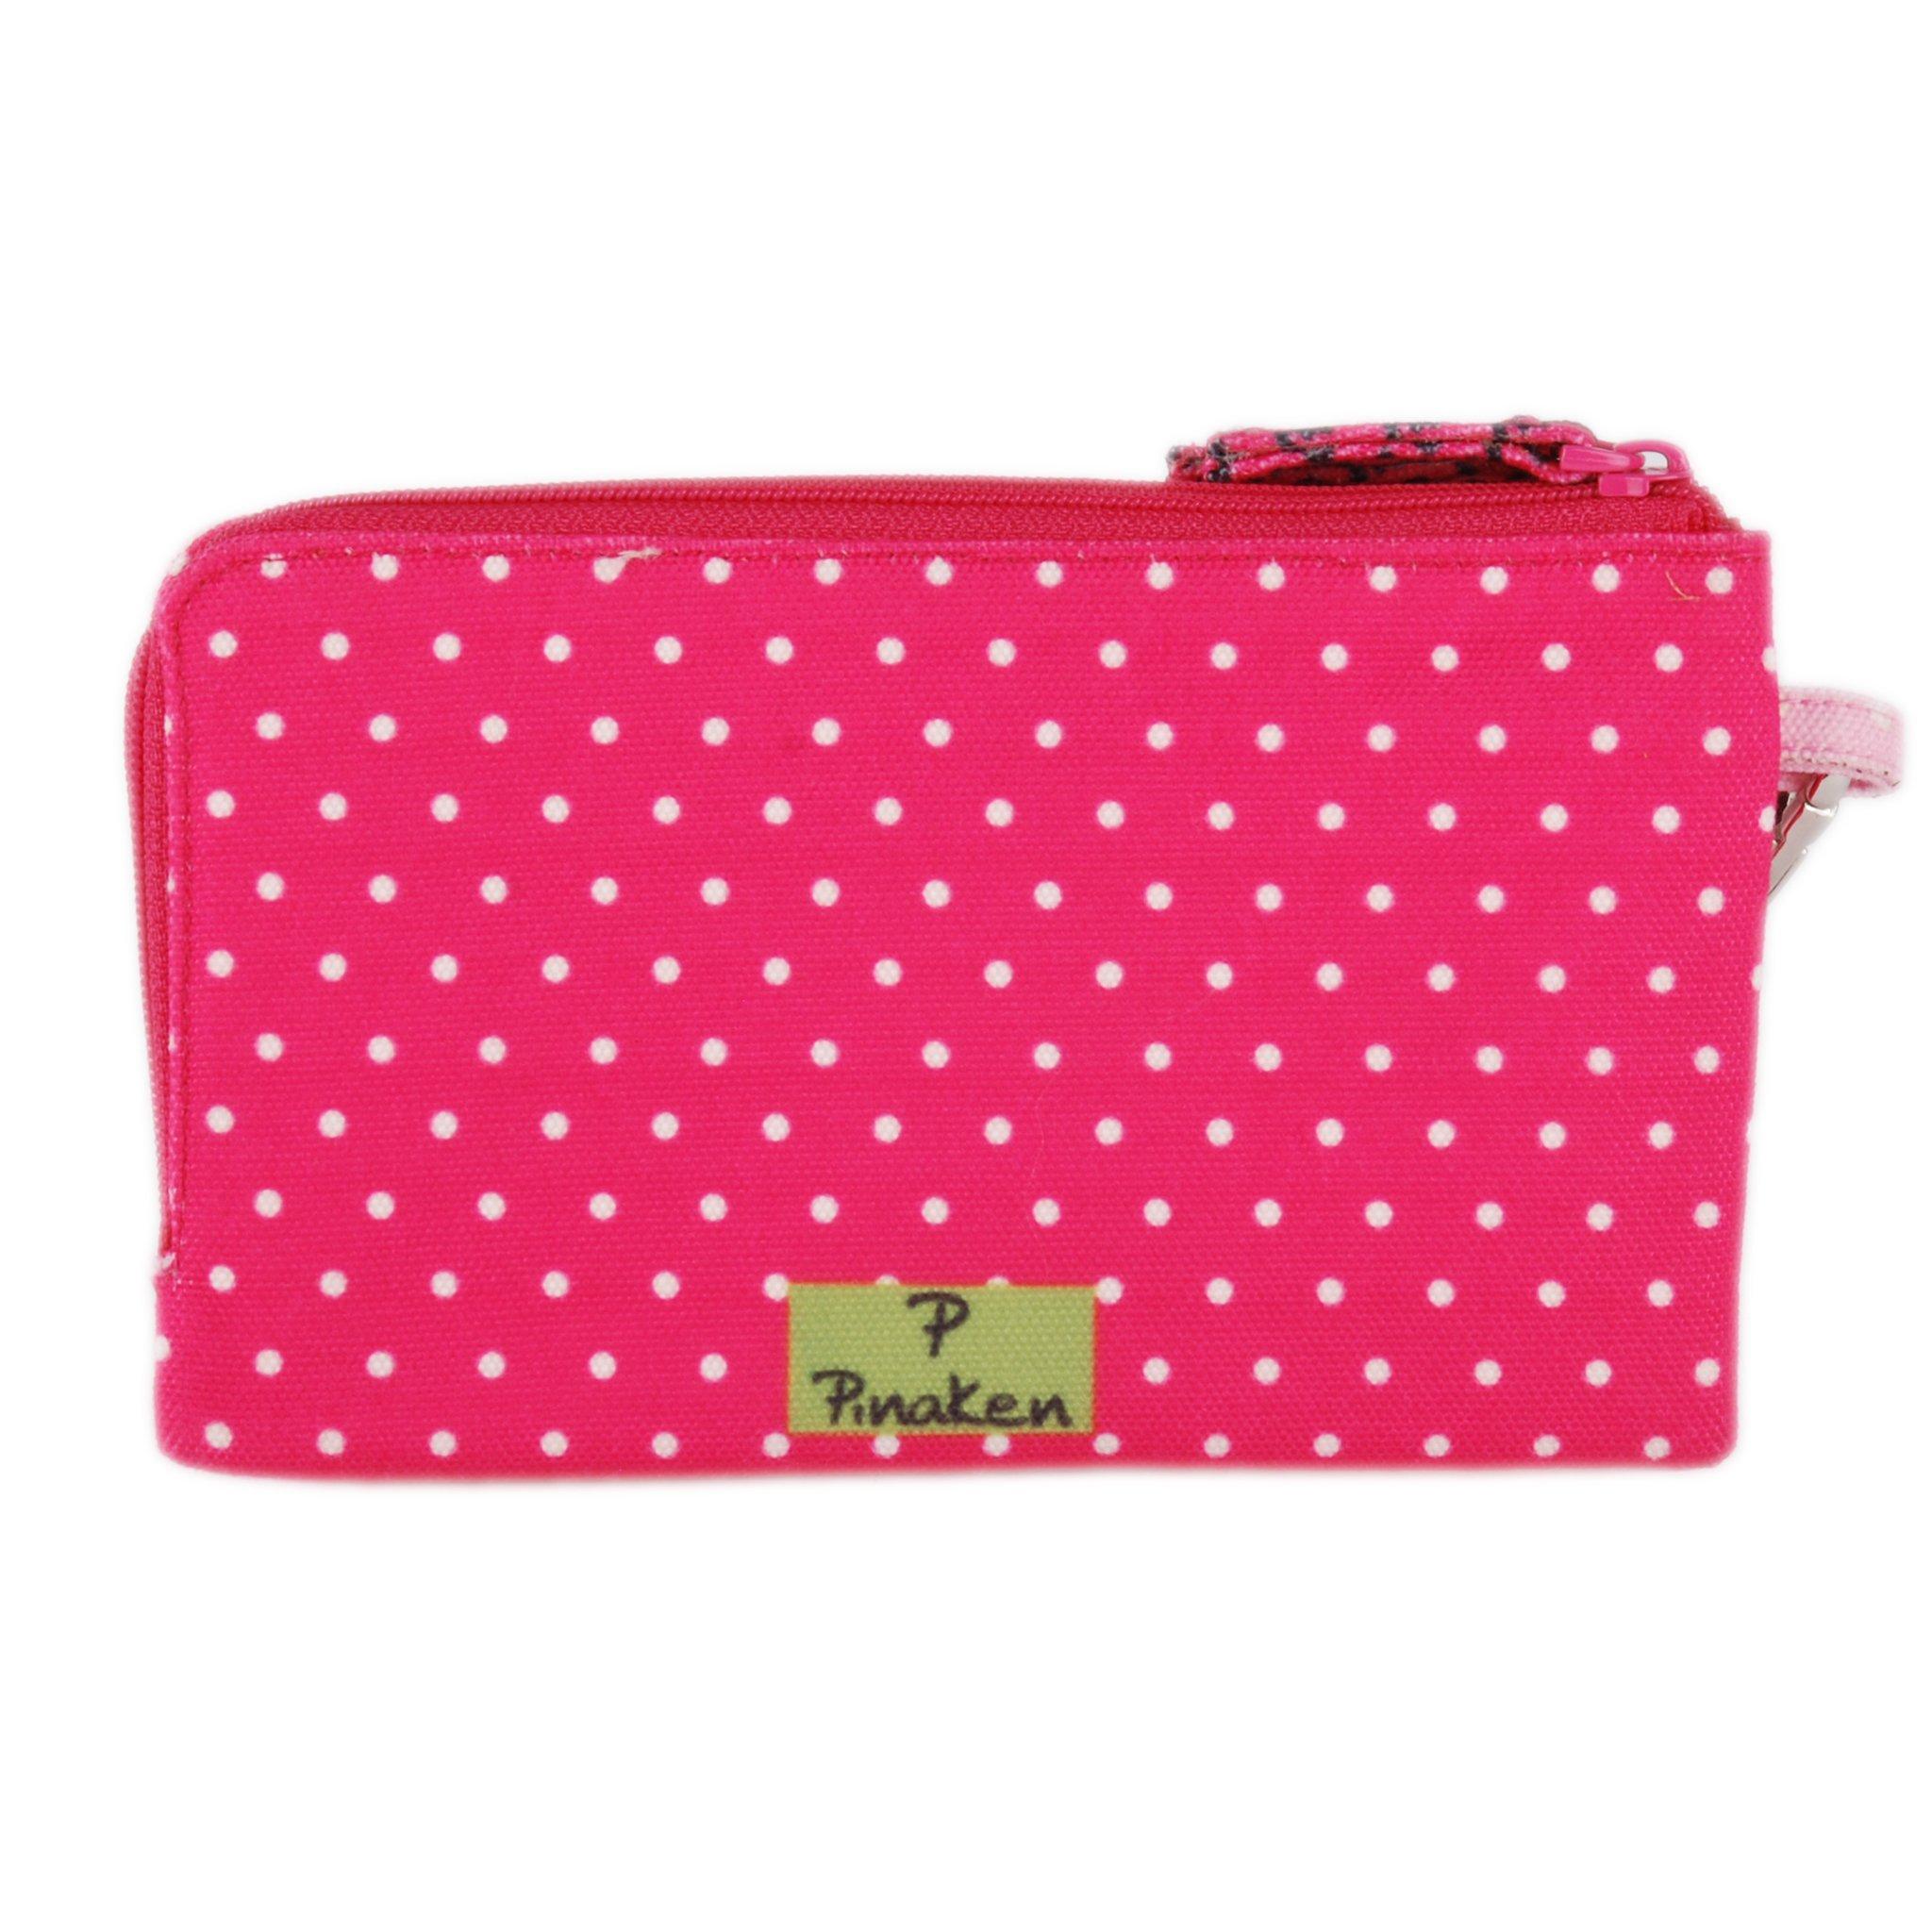 Wristlet removable clutch travel bag purse money pouch wallet organizer by Pinaken (Image #3)